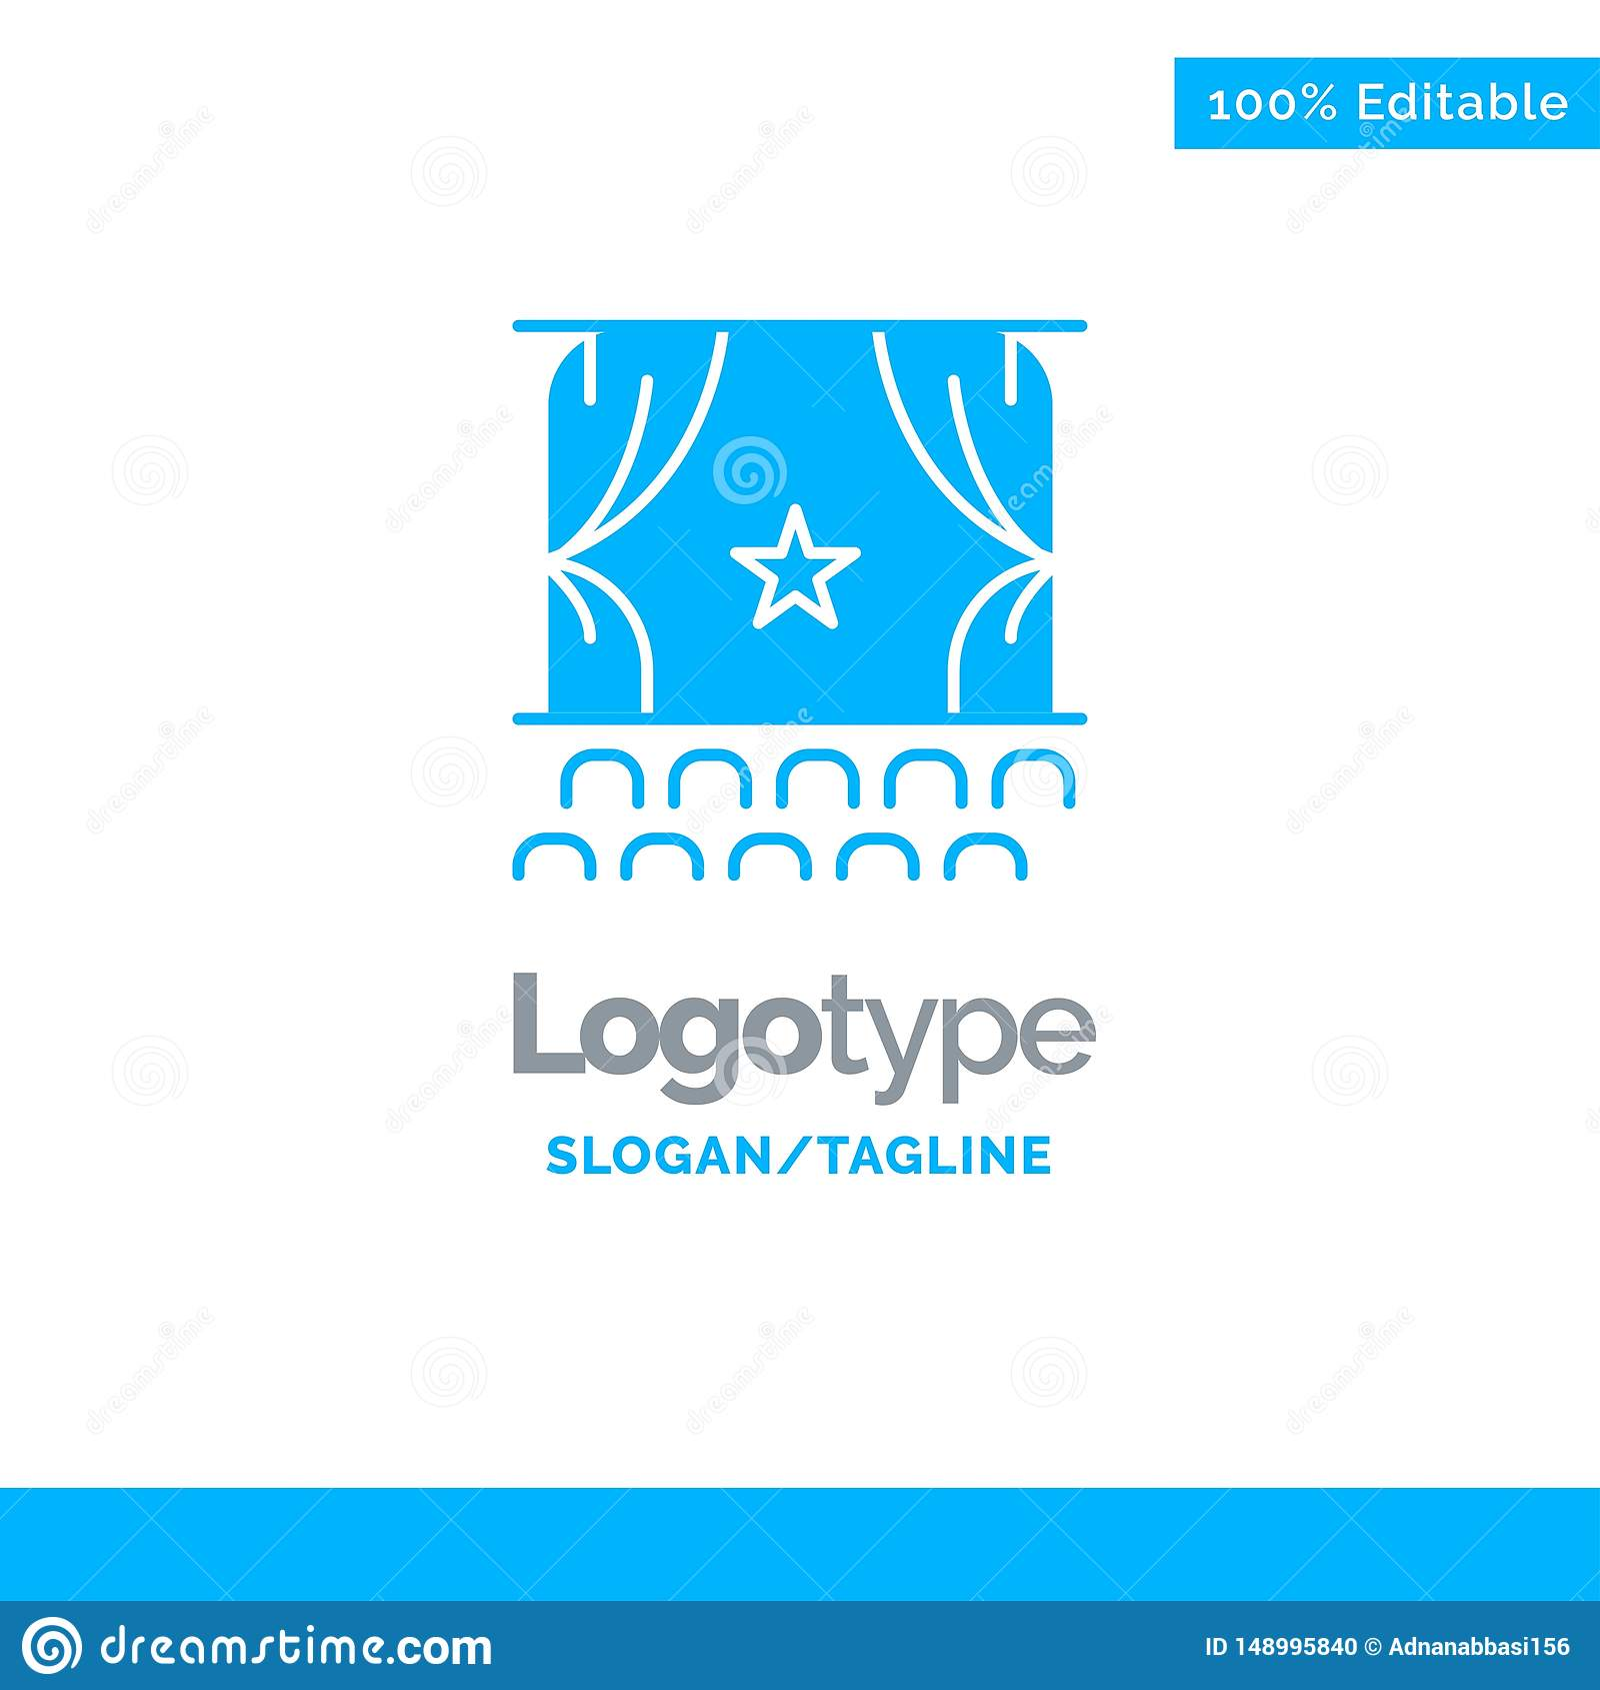 Cinema, Debut, Film, Performance, Premiere Blue Solid Logo Template. Place for Tagline